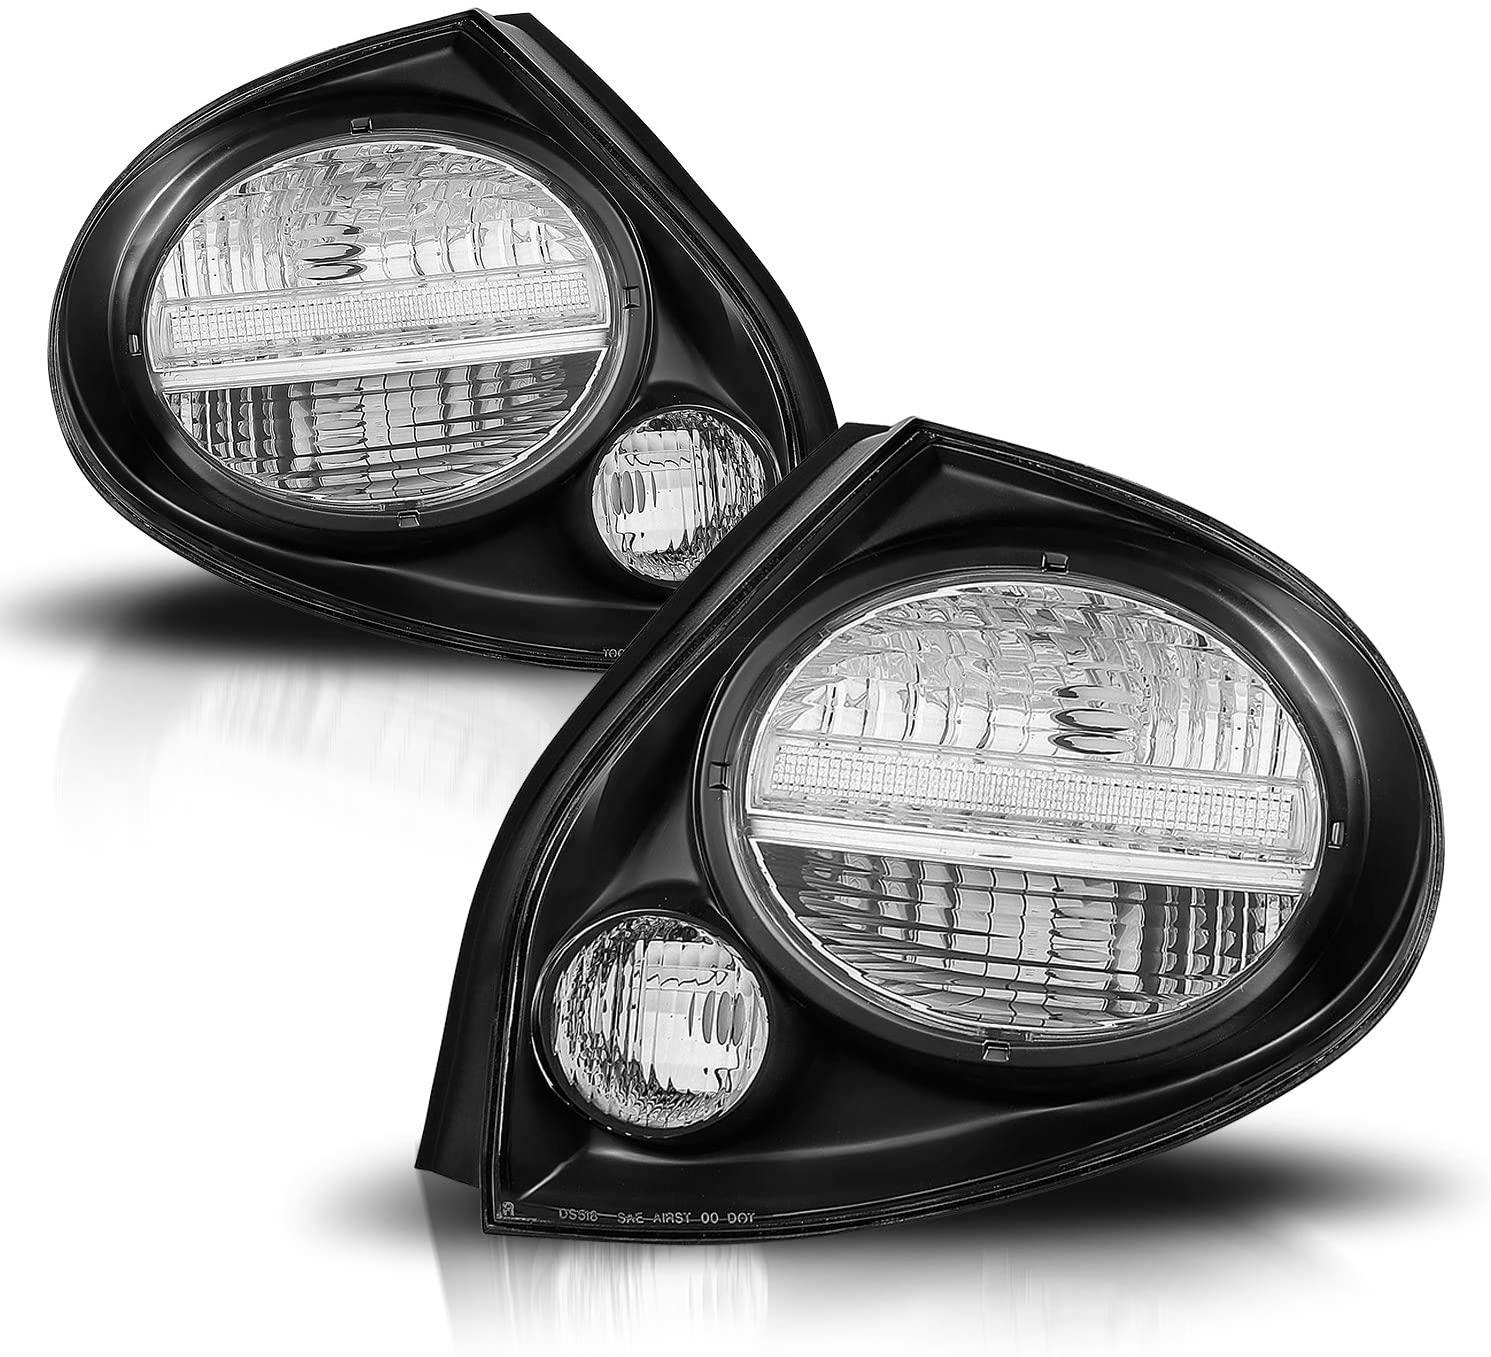 AmeriLite Taillights Black for Maxima - Passenger and Driver Side